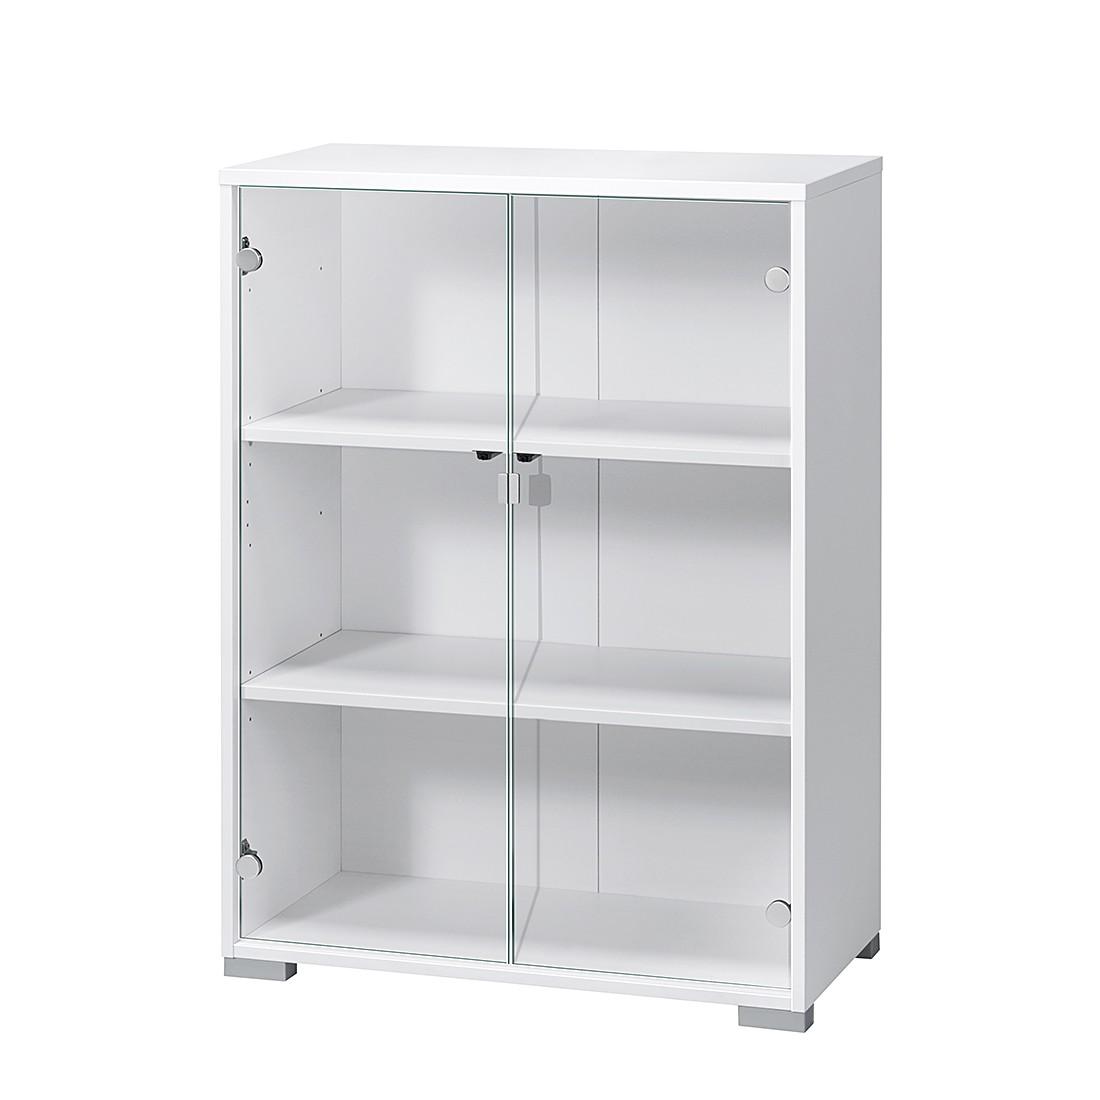 Aktenschrank Merit II – Weiß/Glas, Maja Möbel bestellen